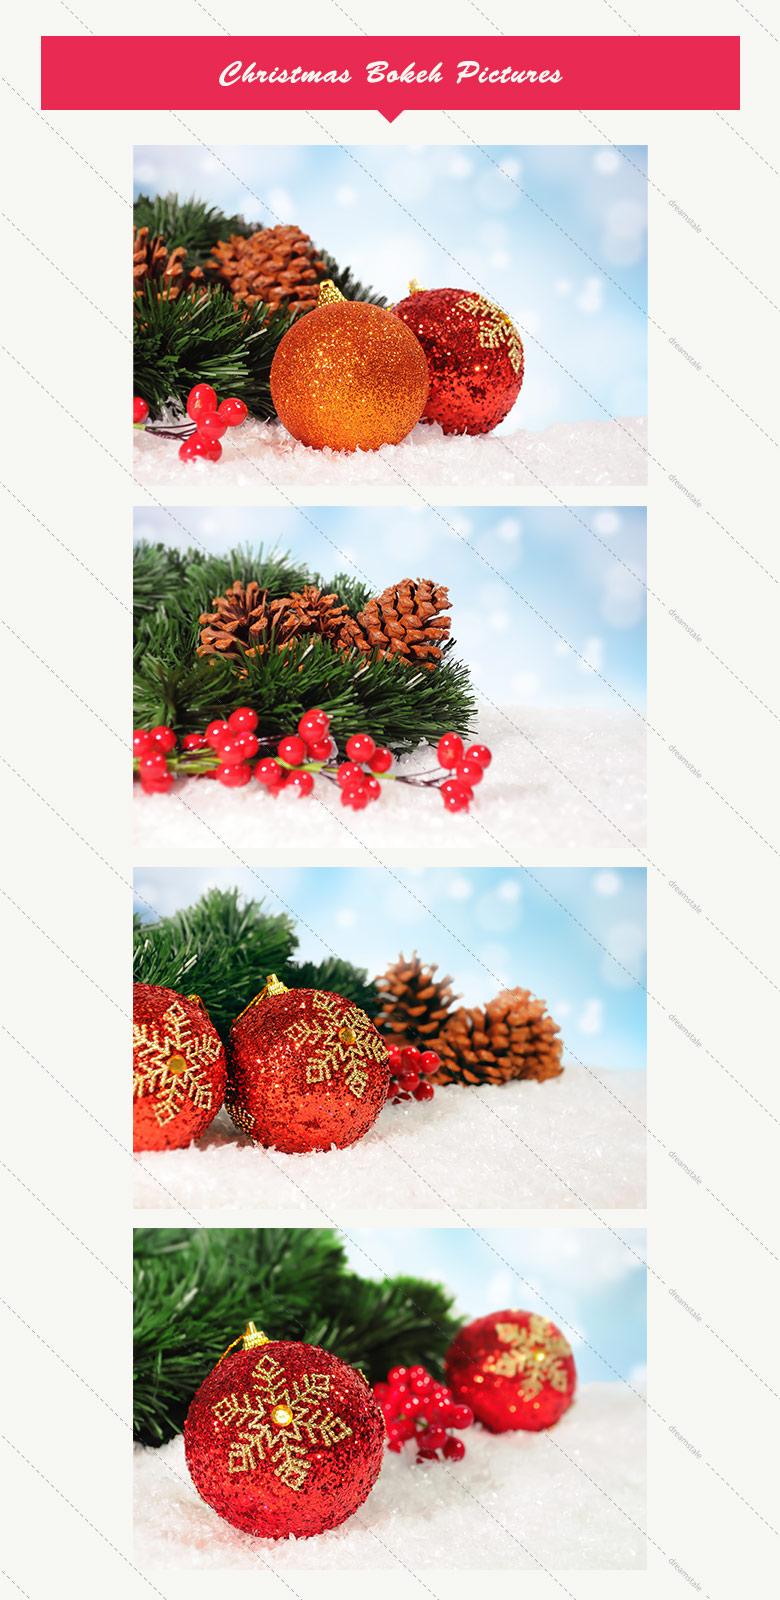 Premium Christmas Bokeh pictures